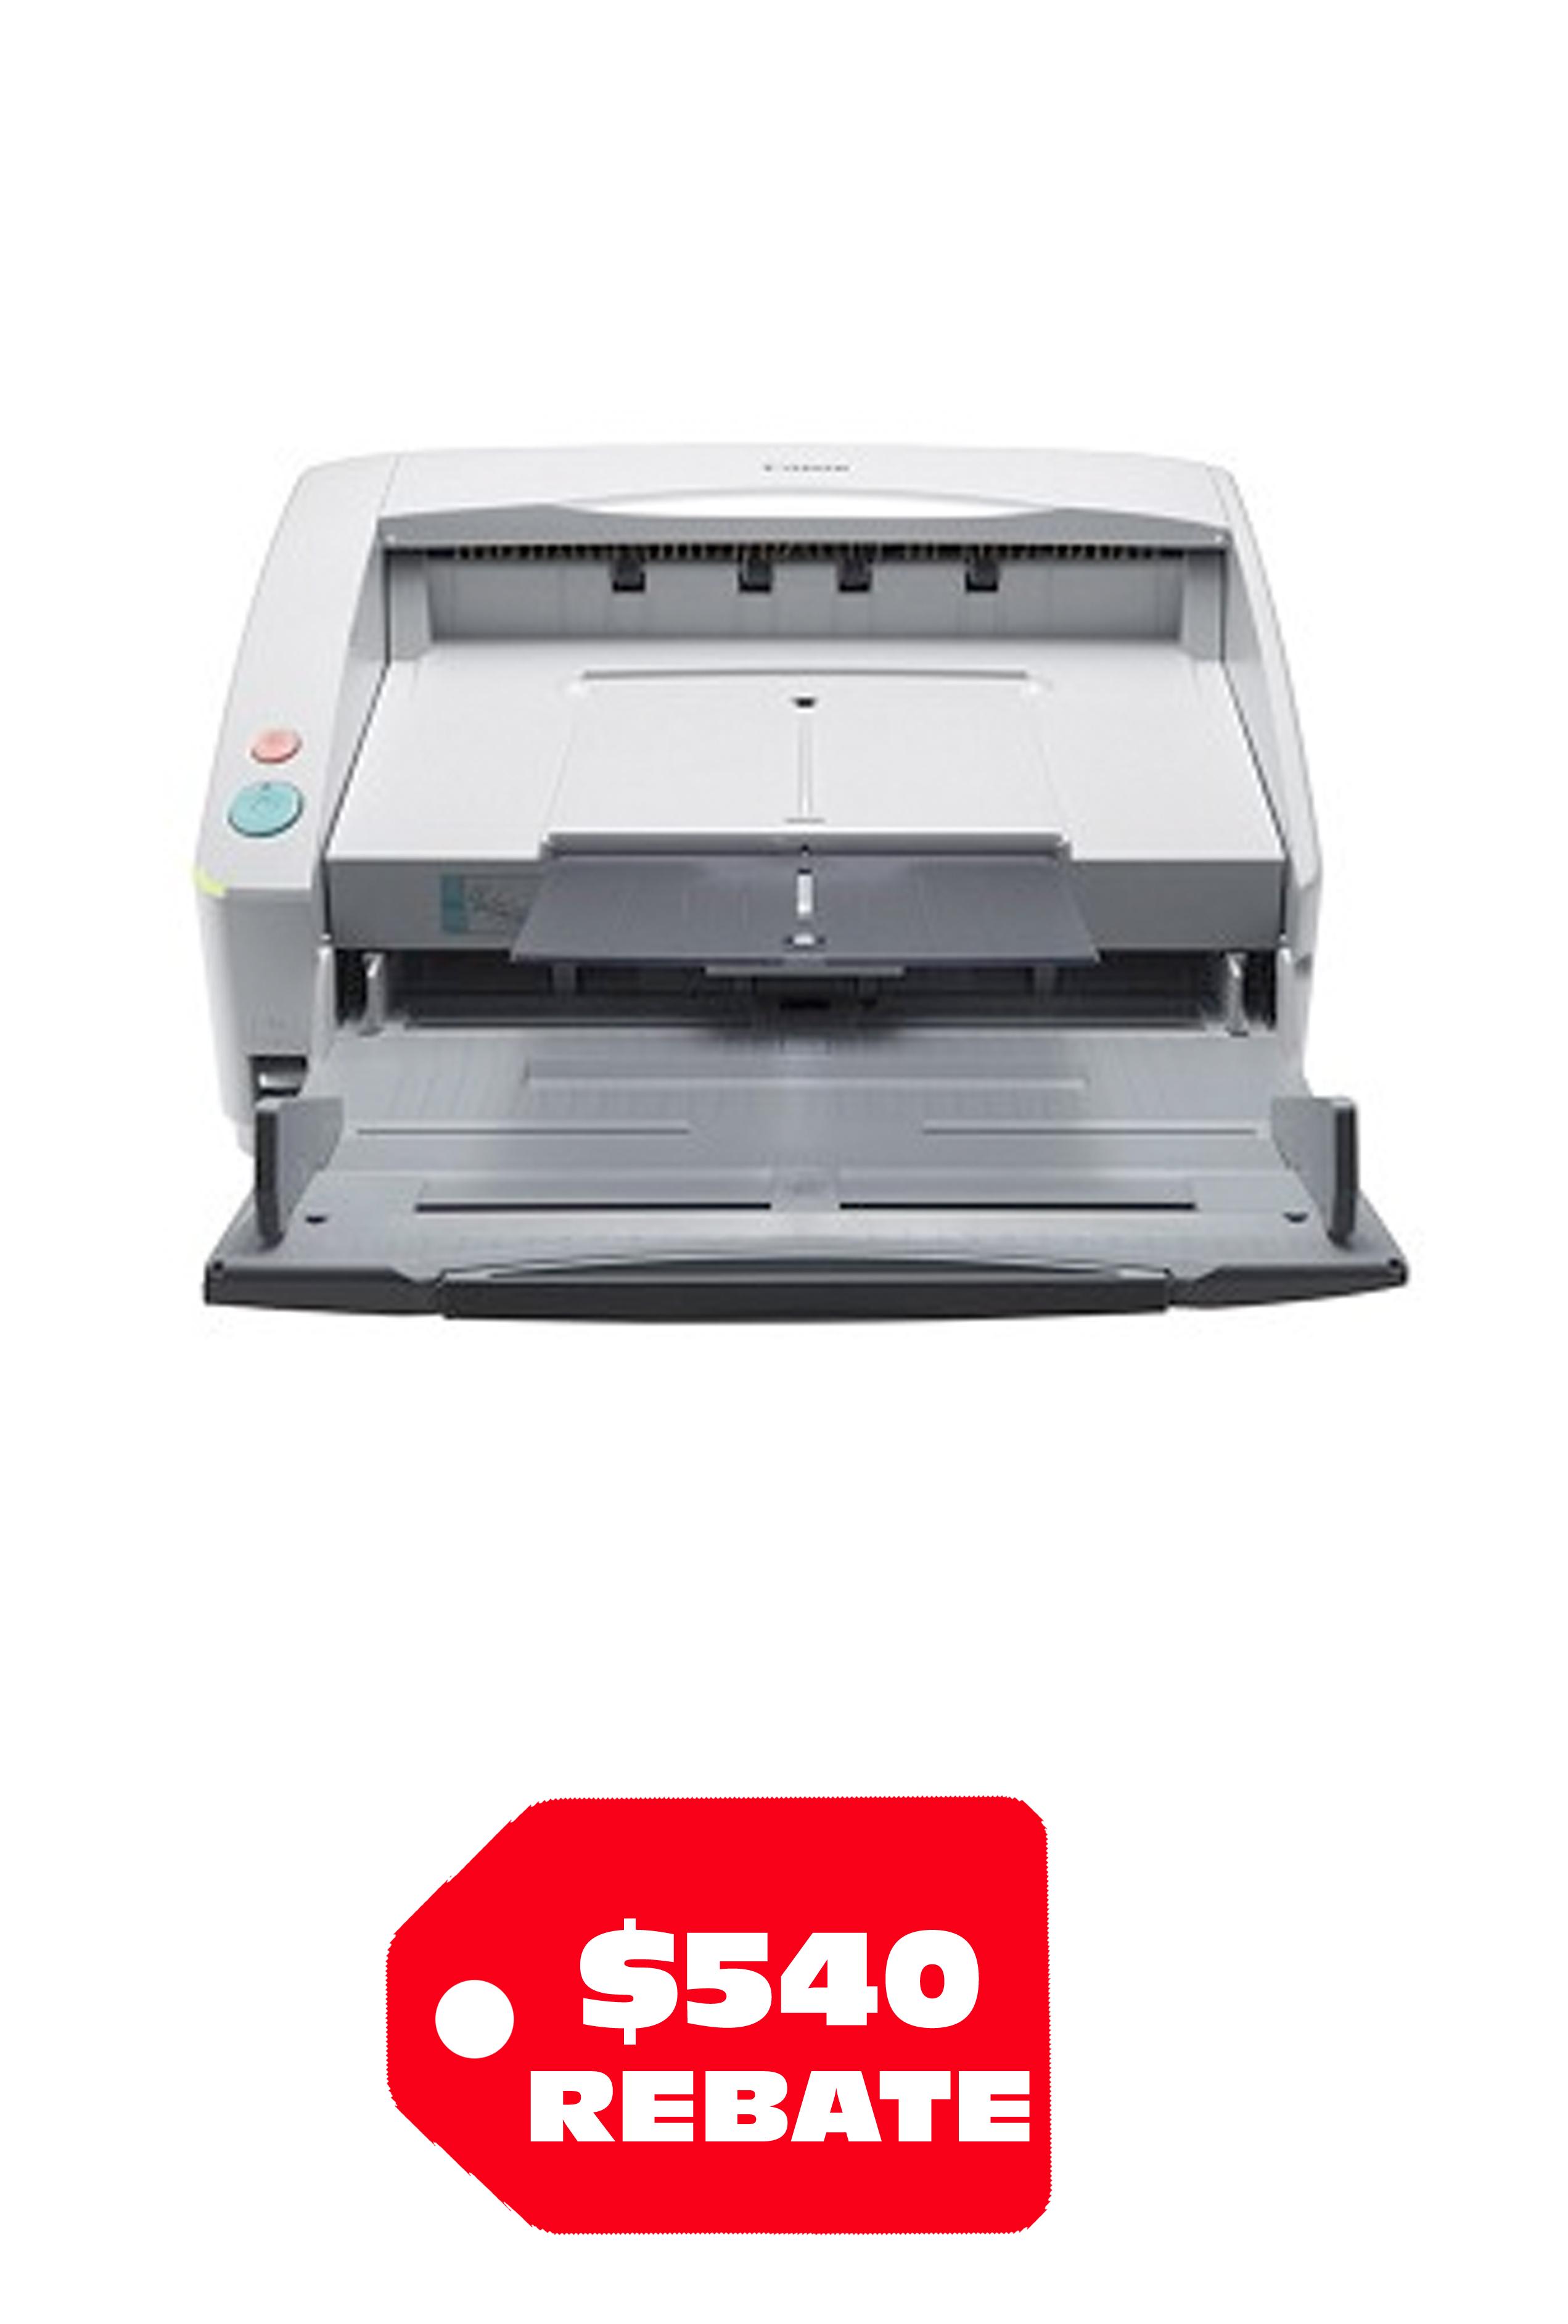 Canon imageFORMULA DR-6030C Office Document Scanner (80 ppm / 160 ipm)